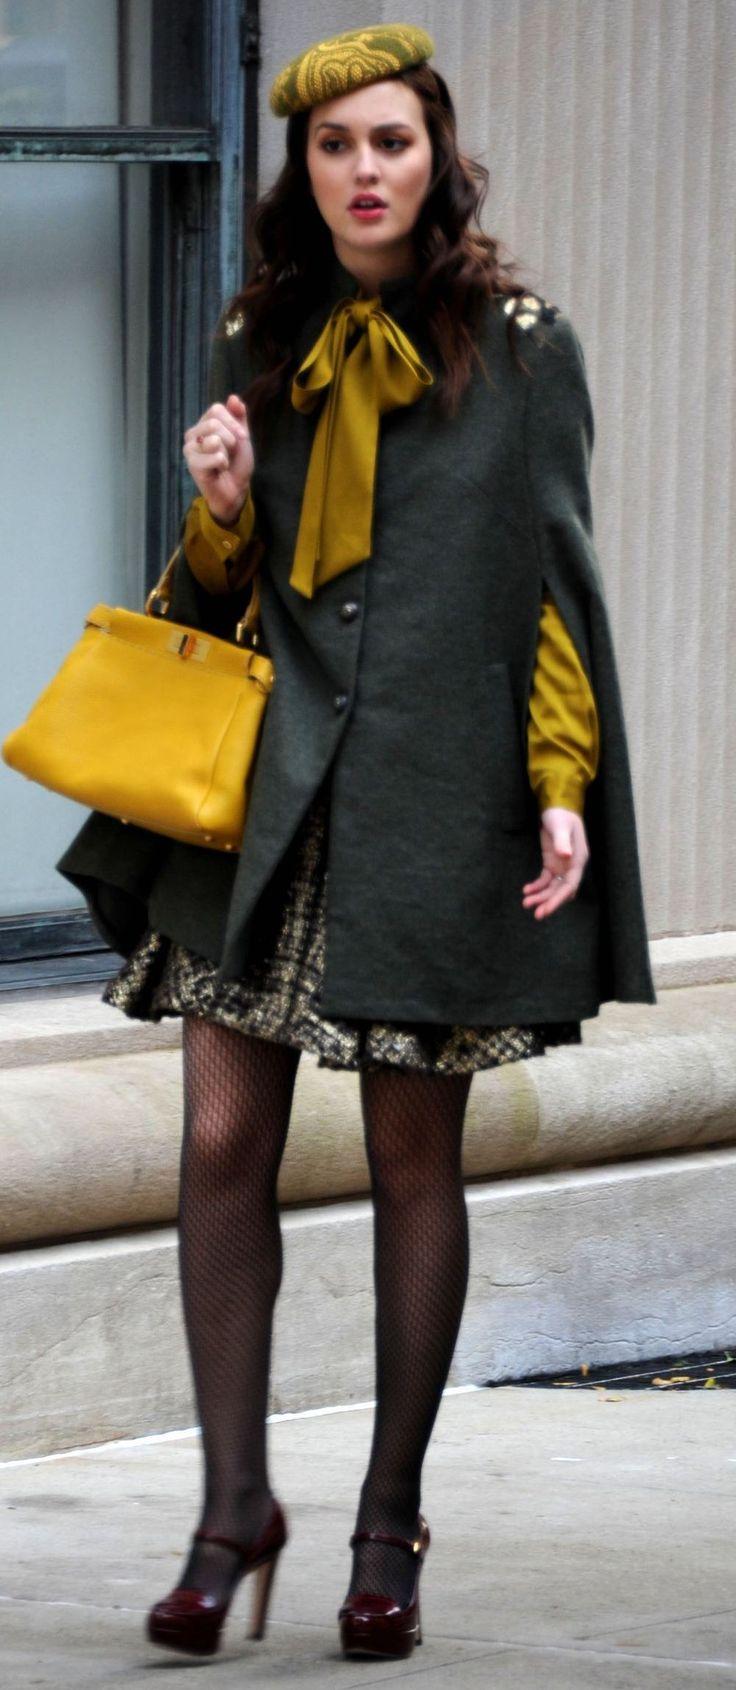 1000+ images about Blair Waldorfu0026#39;s Most Stylish Skirts on Pinterest